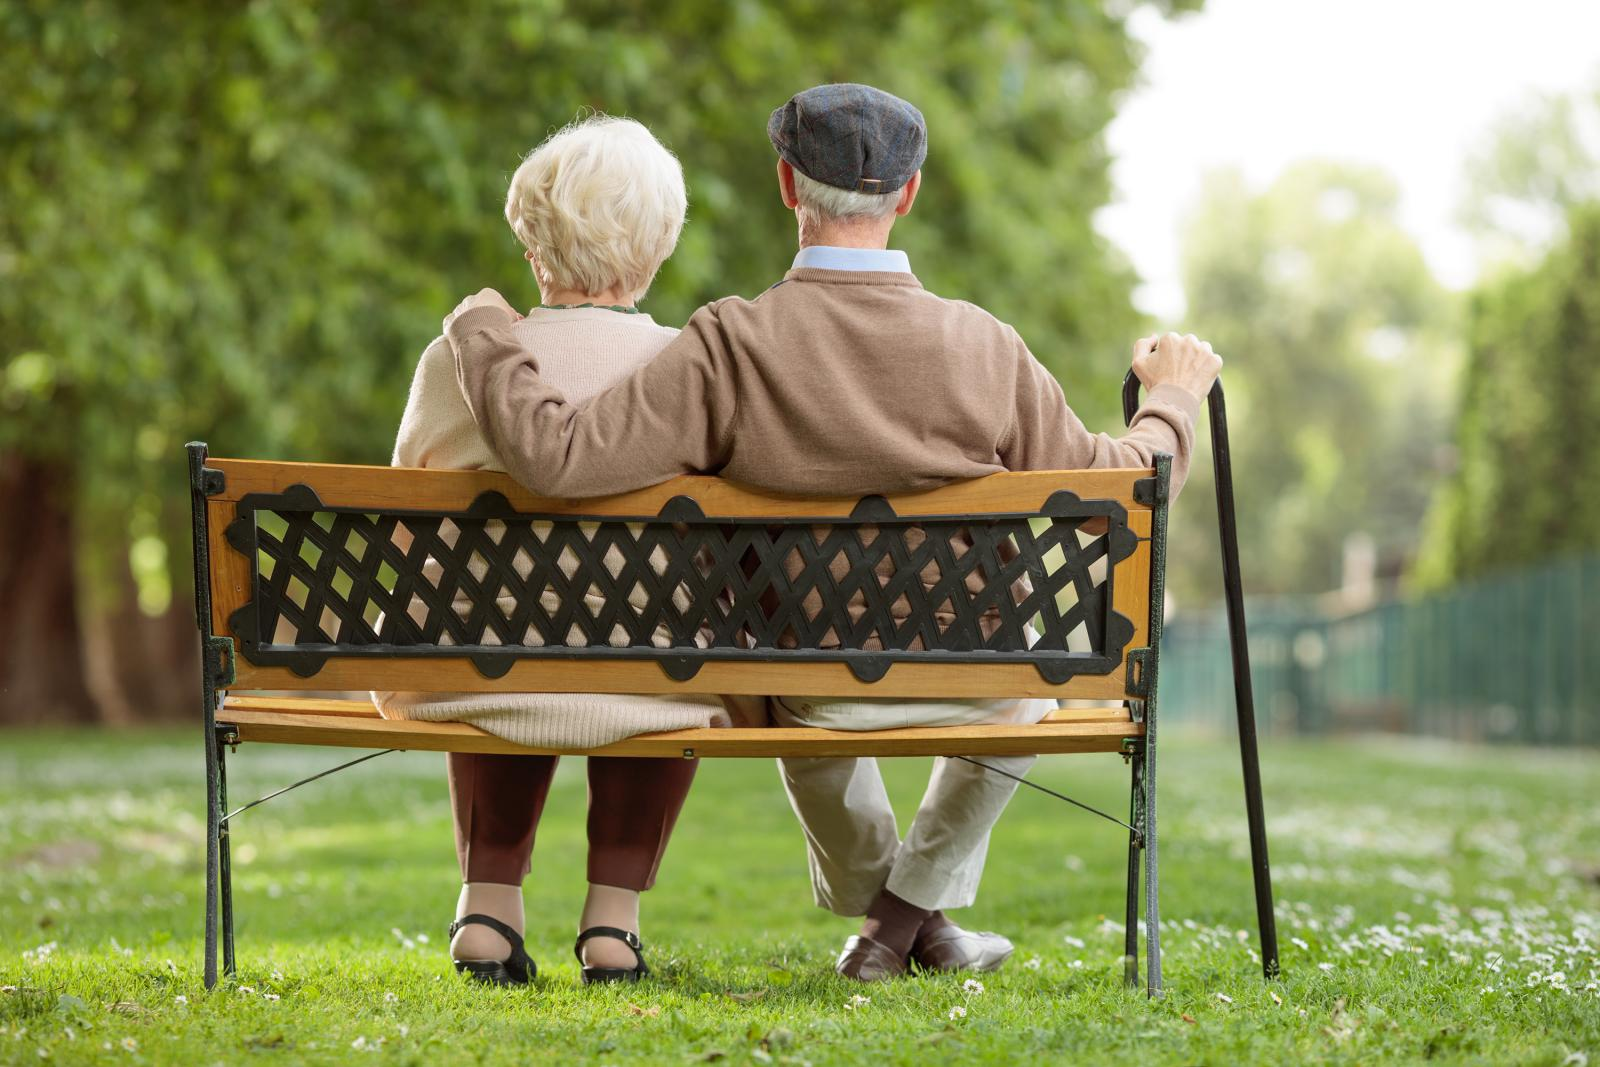 Dating plats kroppen modifiering